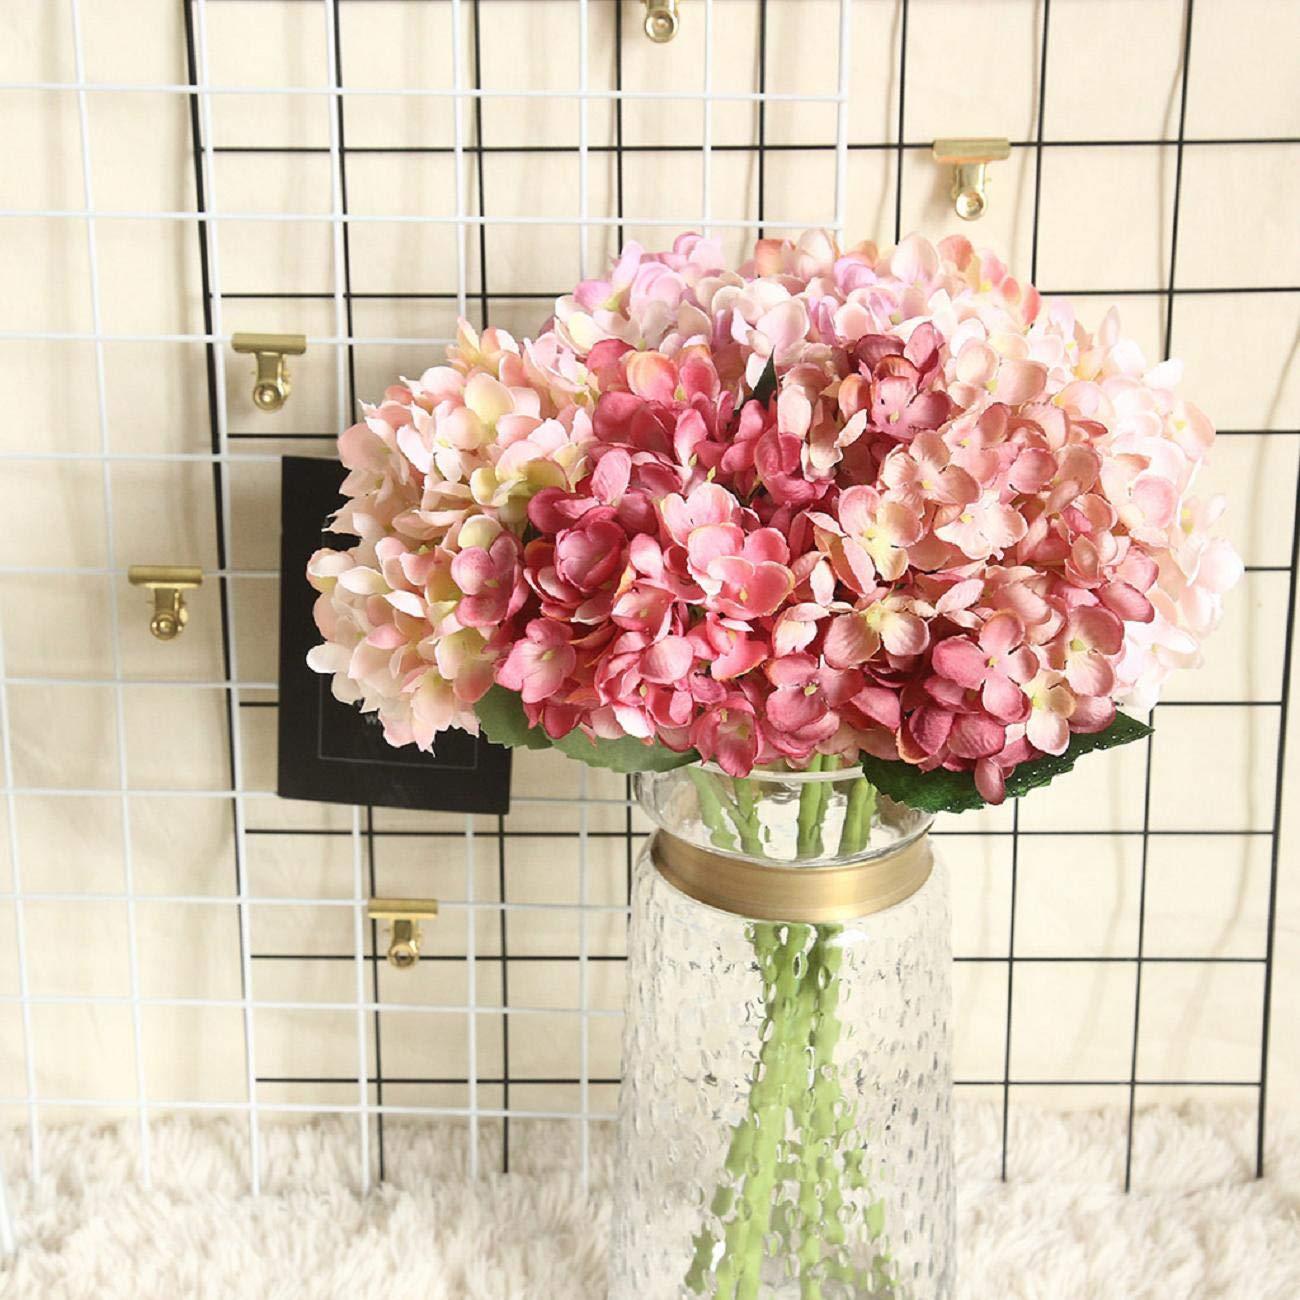 Lomsarsh Flor Artificial Flor de Hortensia Falsa Flor de Seda Falsa Hogar Hotel Oficina Banquete de Boda Jardín…